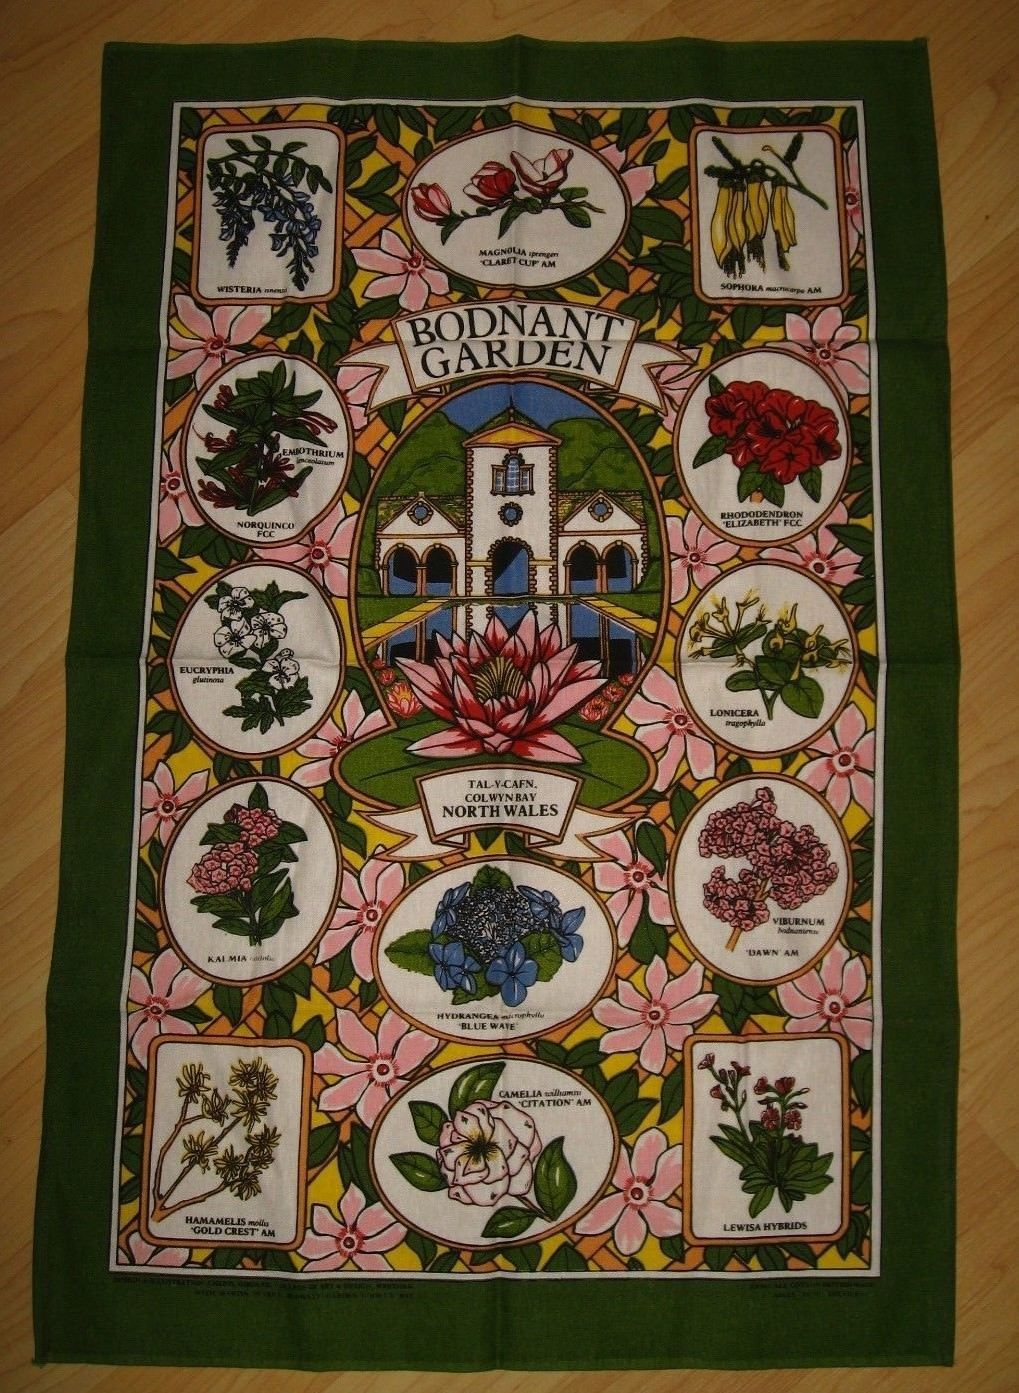 Bodnant Garden Souvenir Tea Towel - Vintage Sally Jane Textiles Colwyn Bay Wales